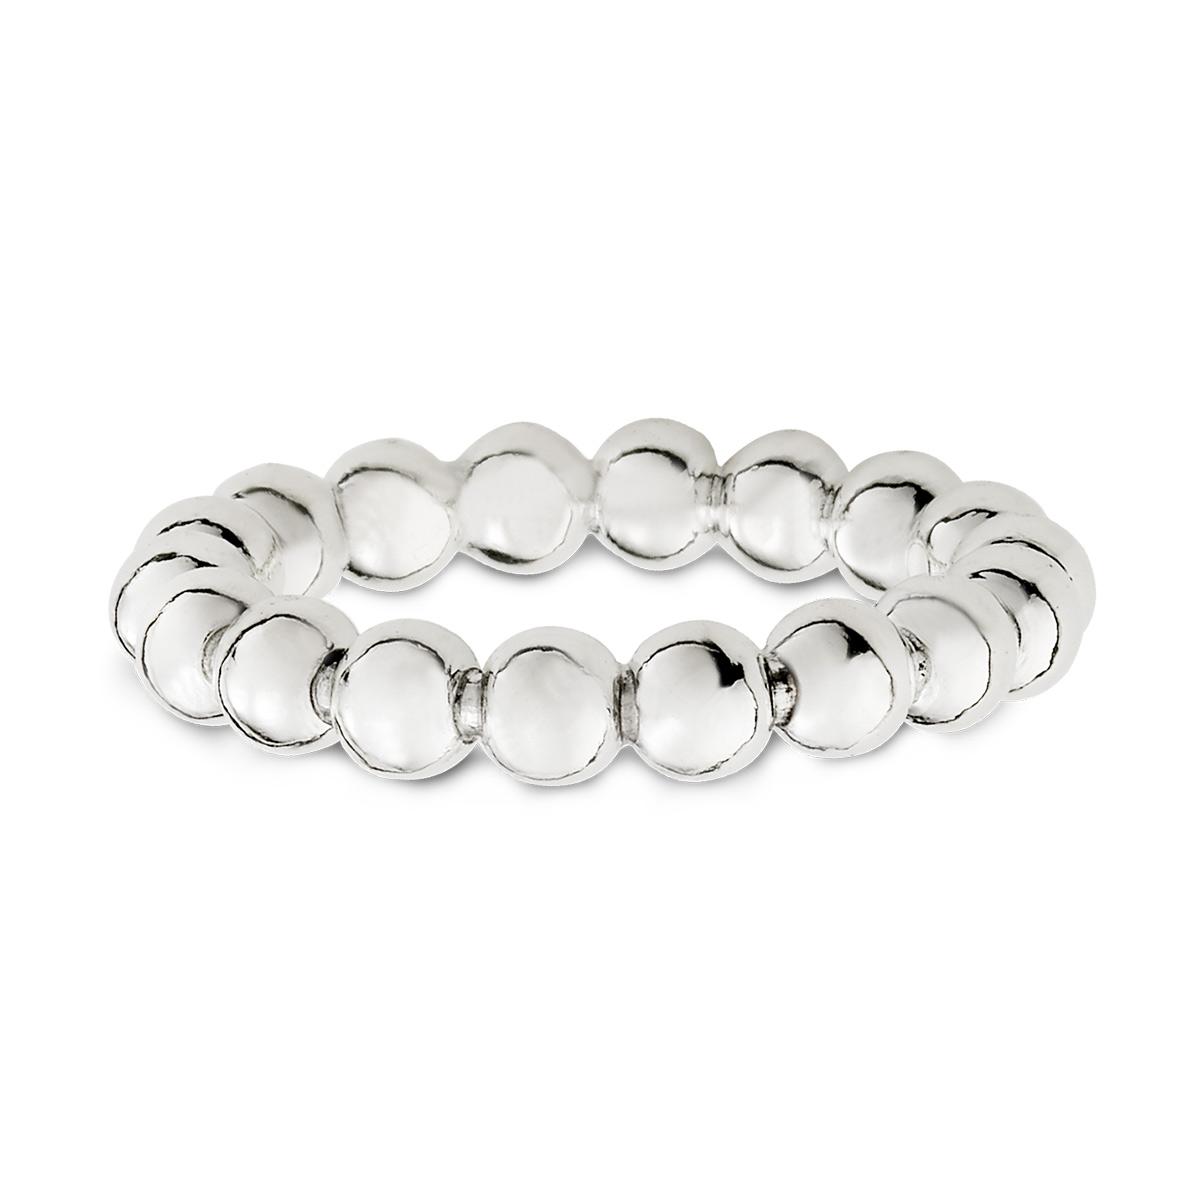 KSW331 點滴意象-魔力珠珠戒指